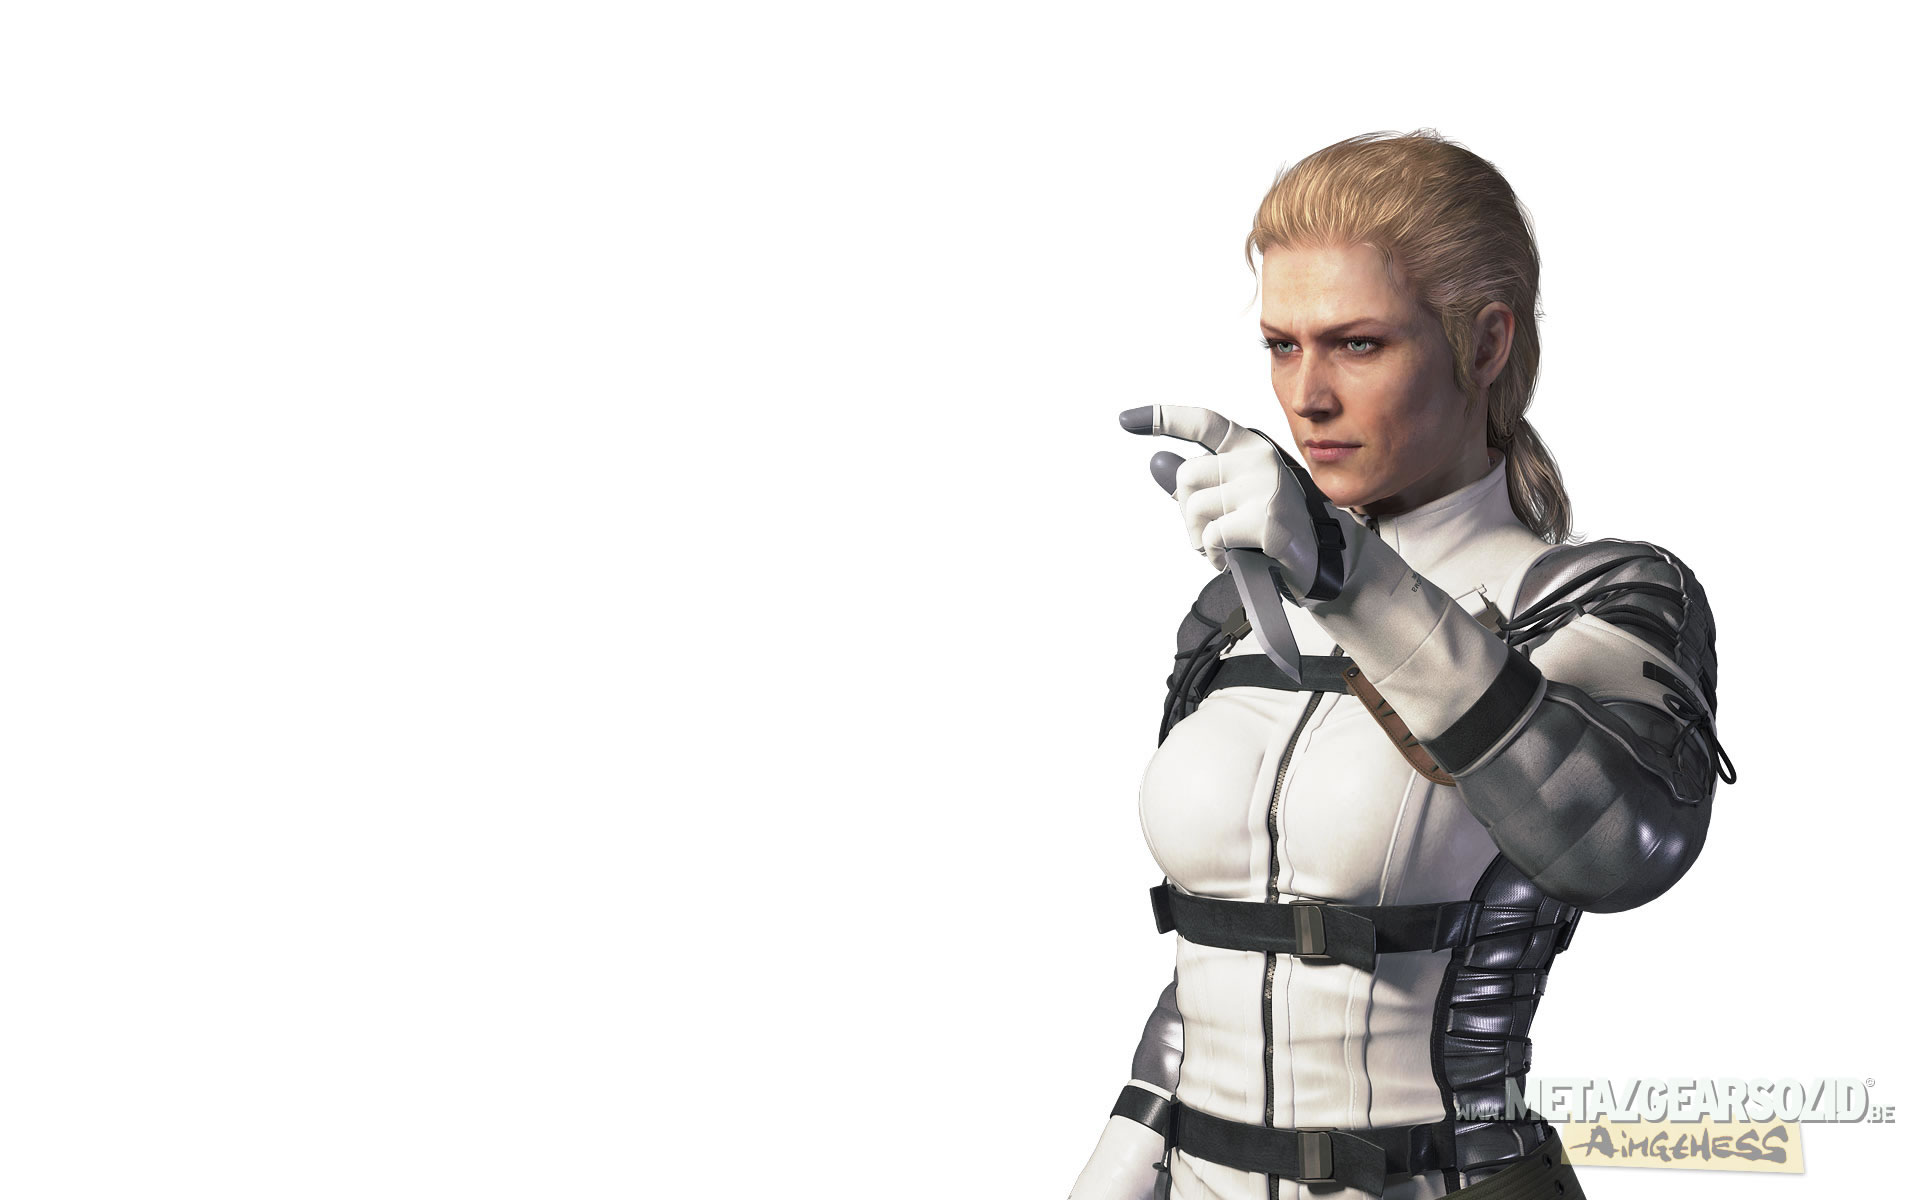 Metal Gear Solid 3: Snake Eater / Персонажи - Metal Gear Solid 3: Snake Eater big boss, eva, арт, Персонаж